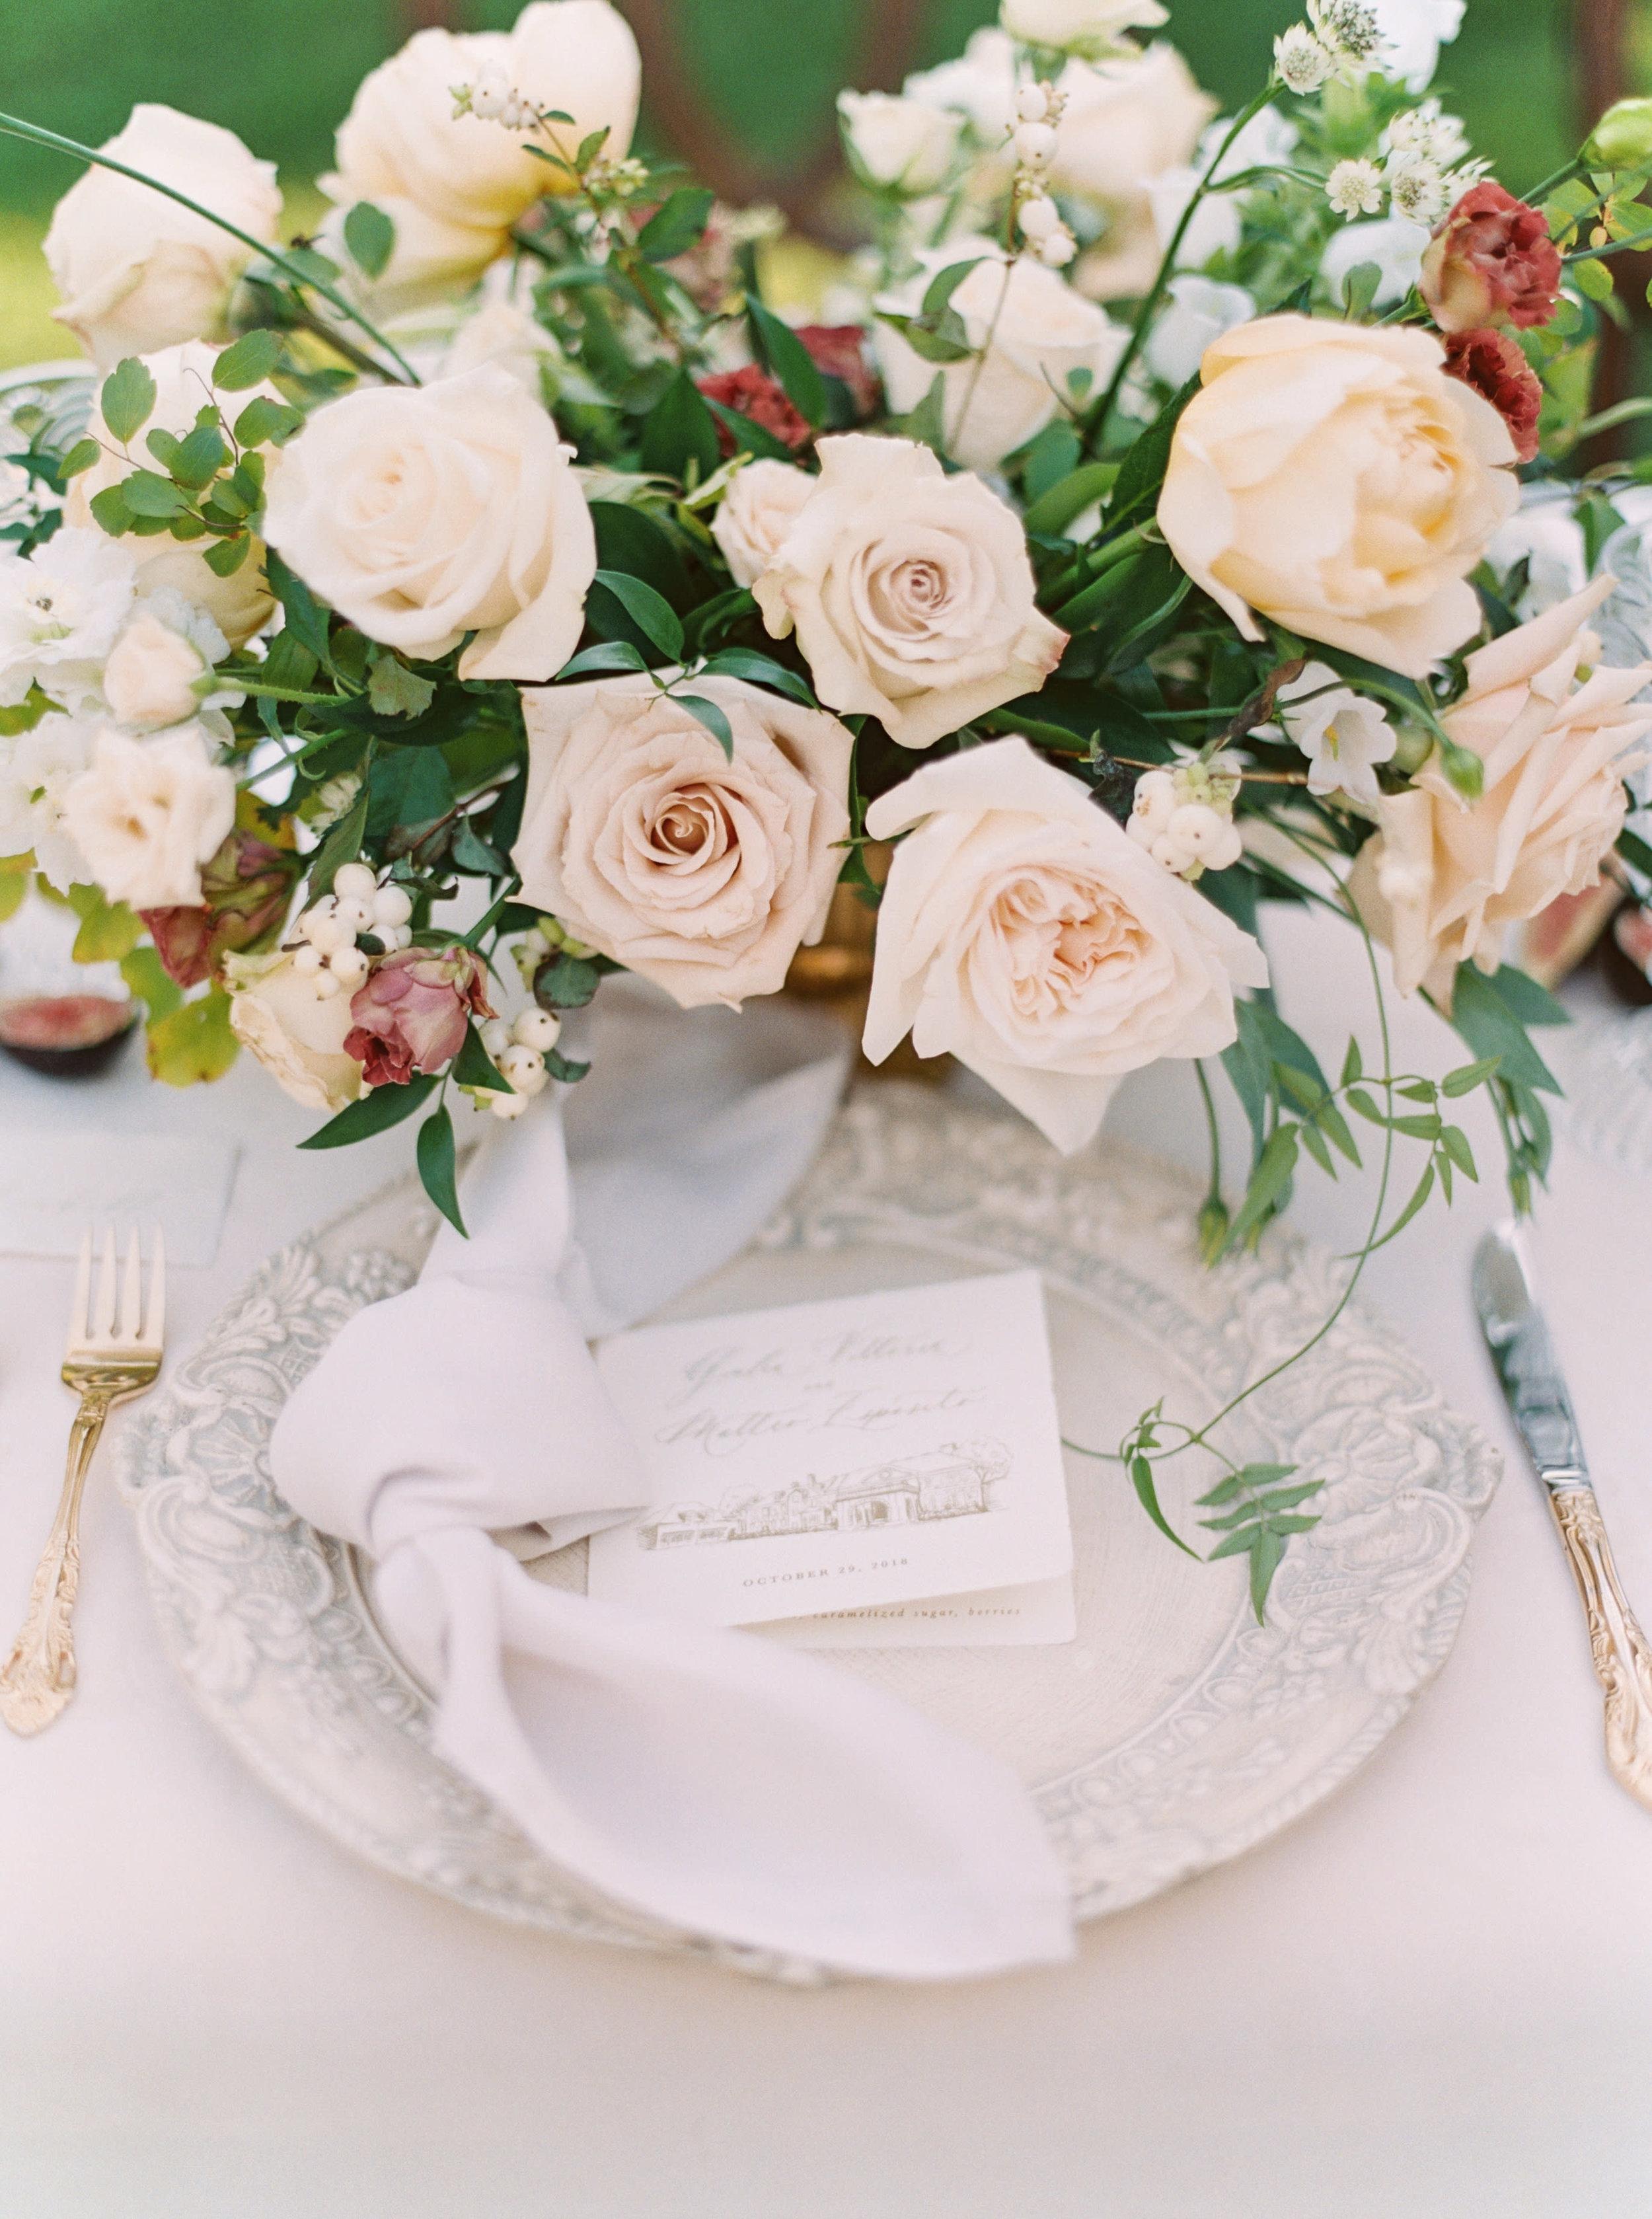 Wedding menu with custom venue illustration.